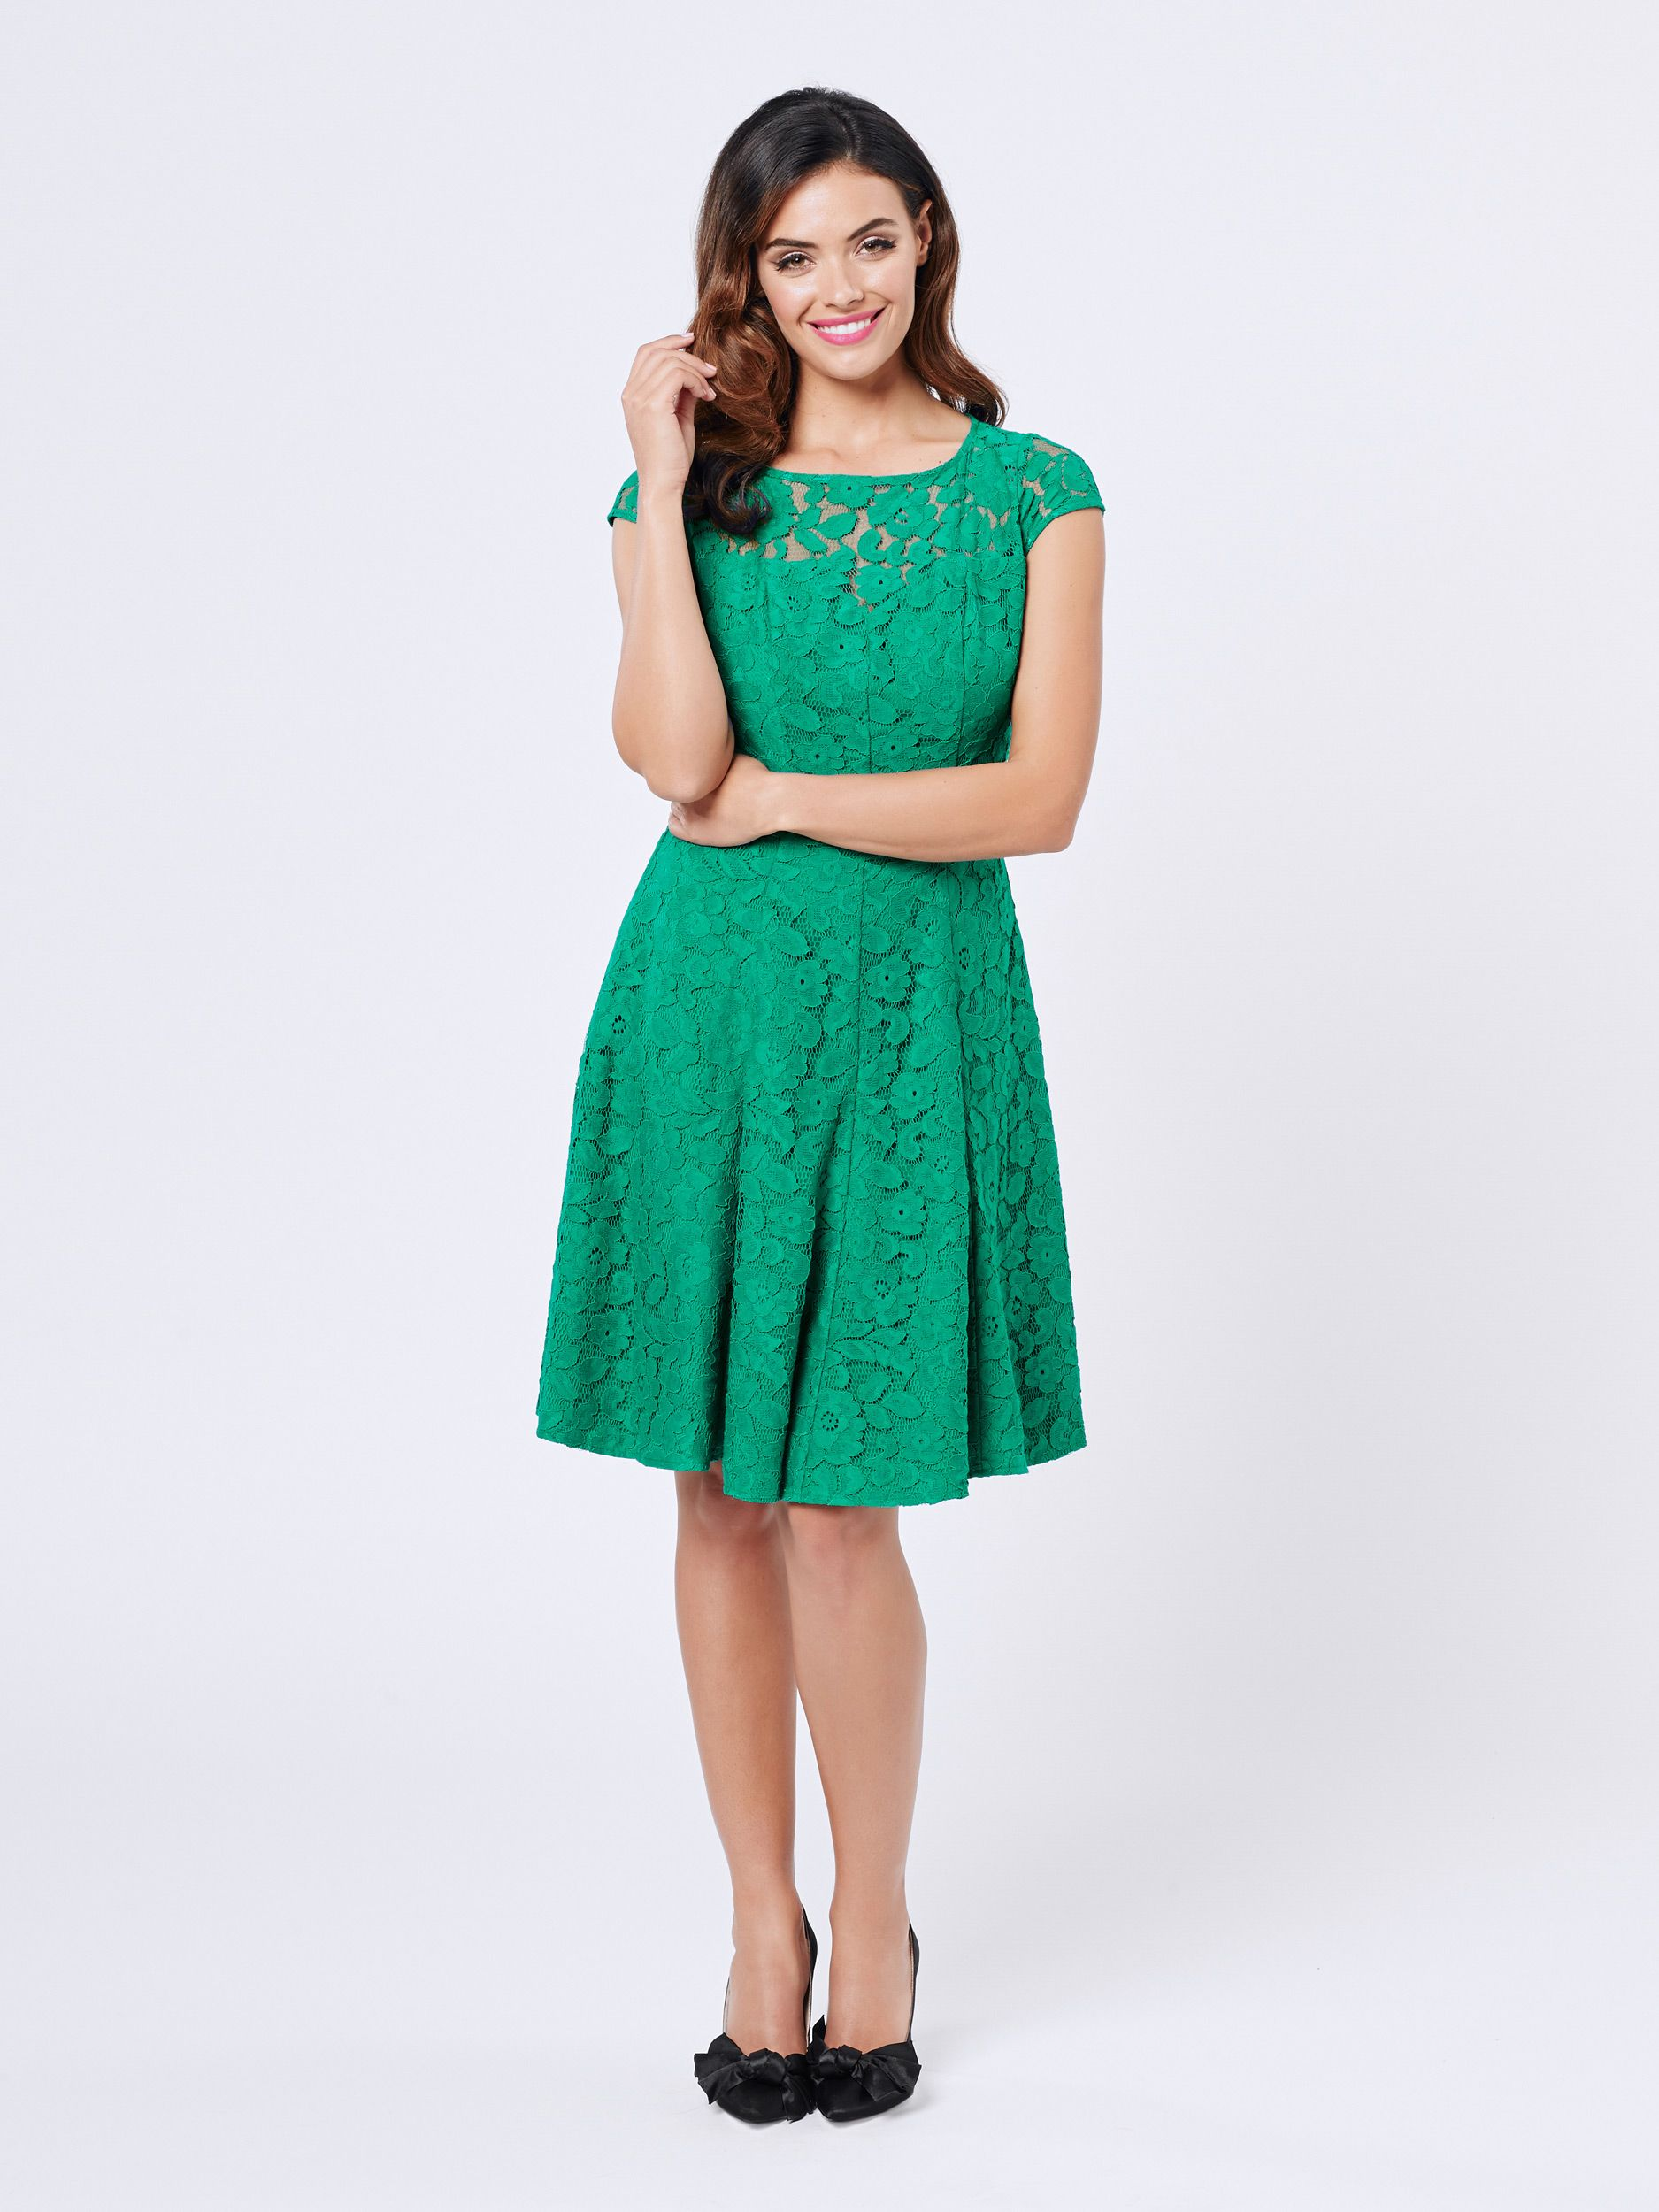 b5c6ab8c98 Green Lace Cocktail Dress Australia - Data Dynamic AG